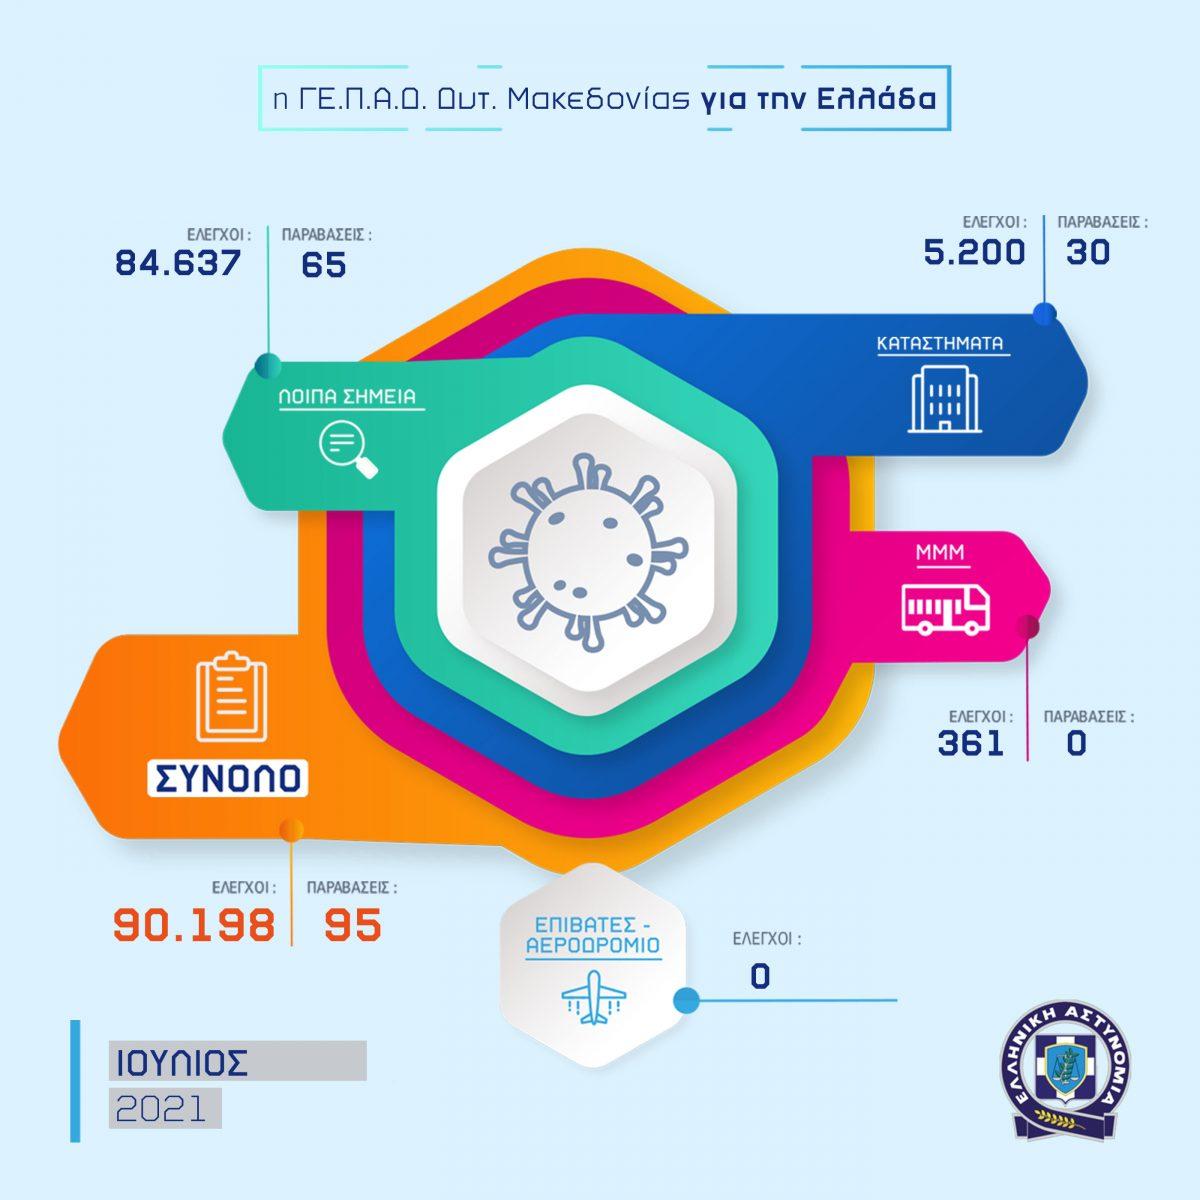 05082021gepaddytmakedonias infographic 002